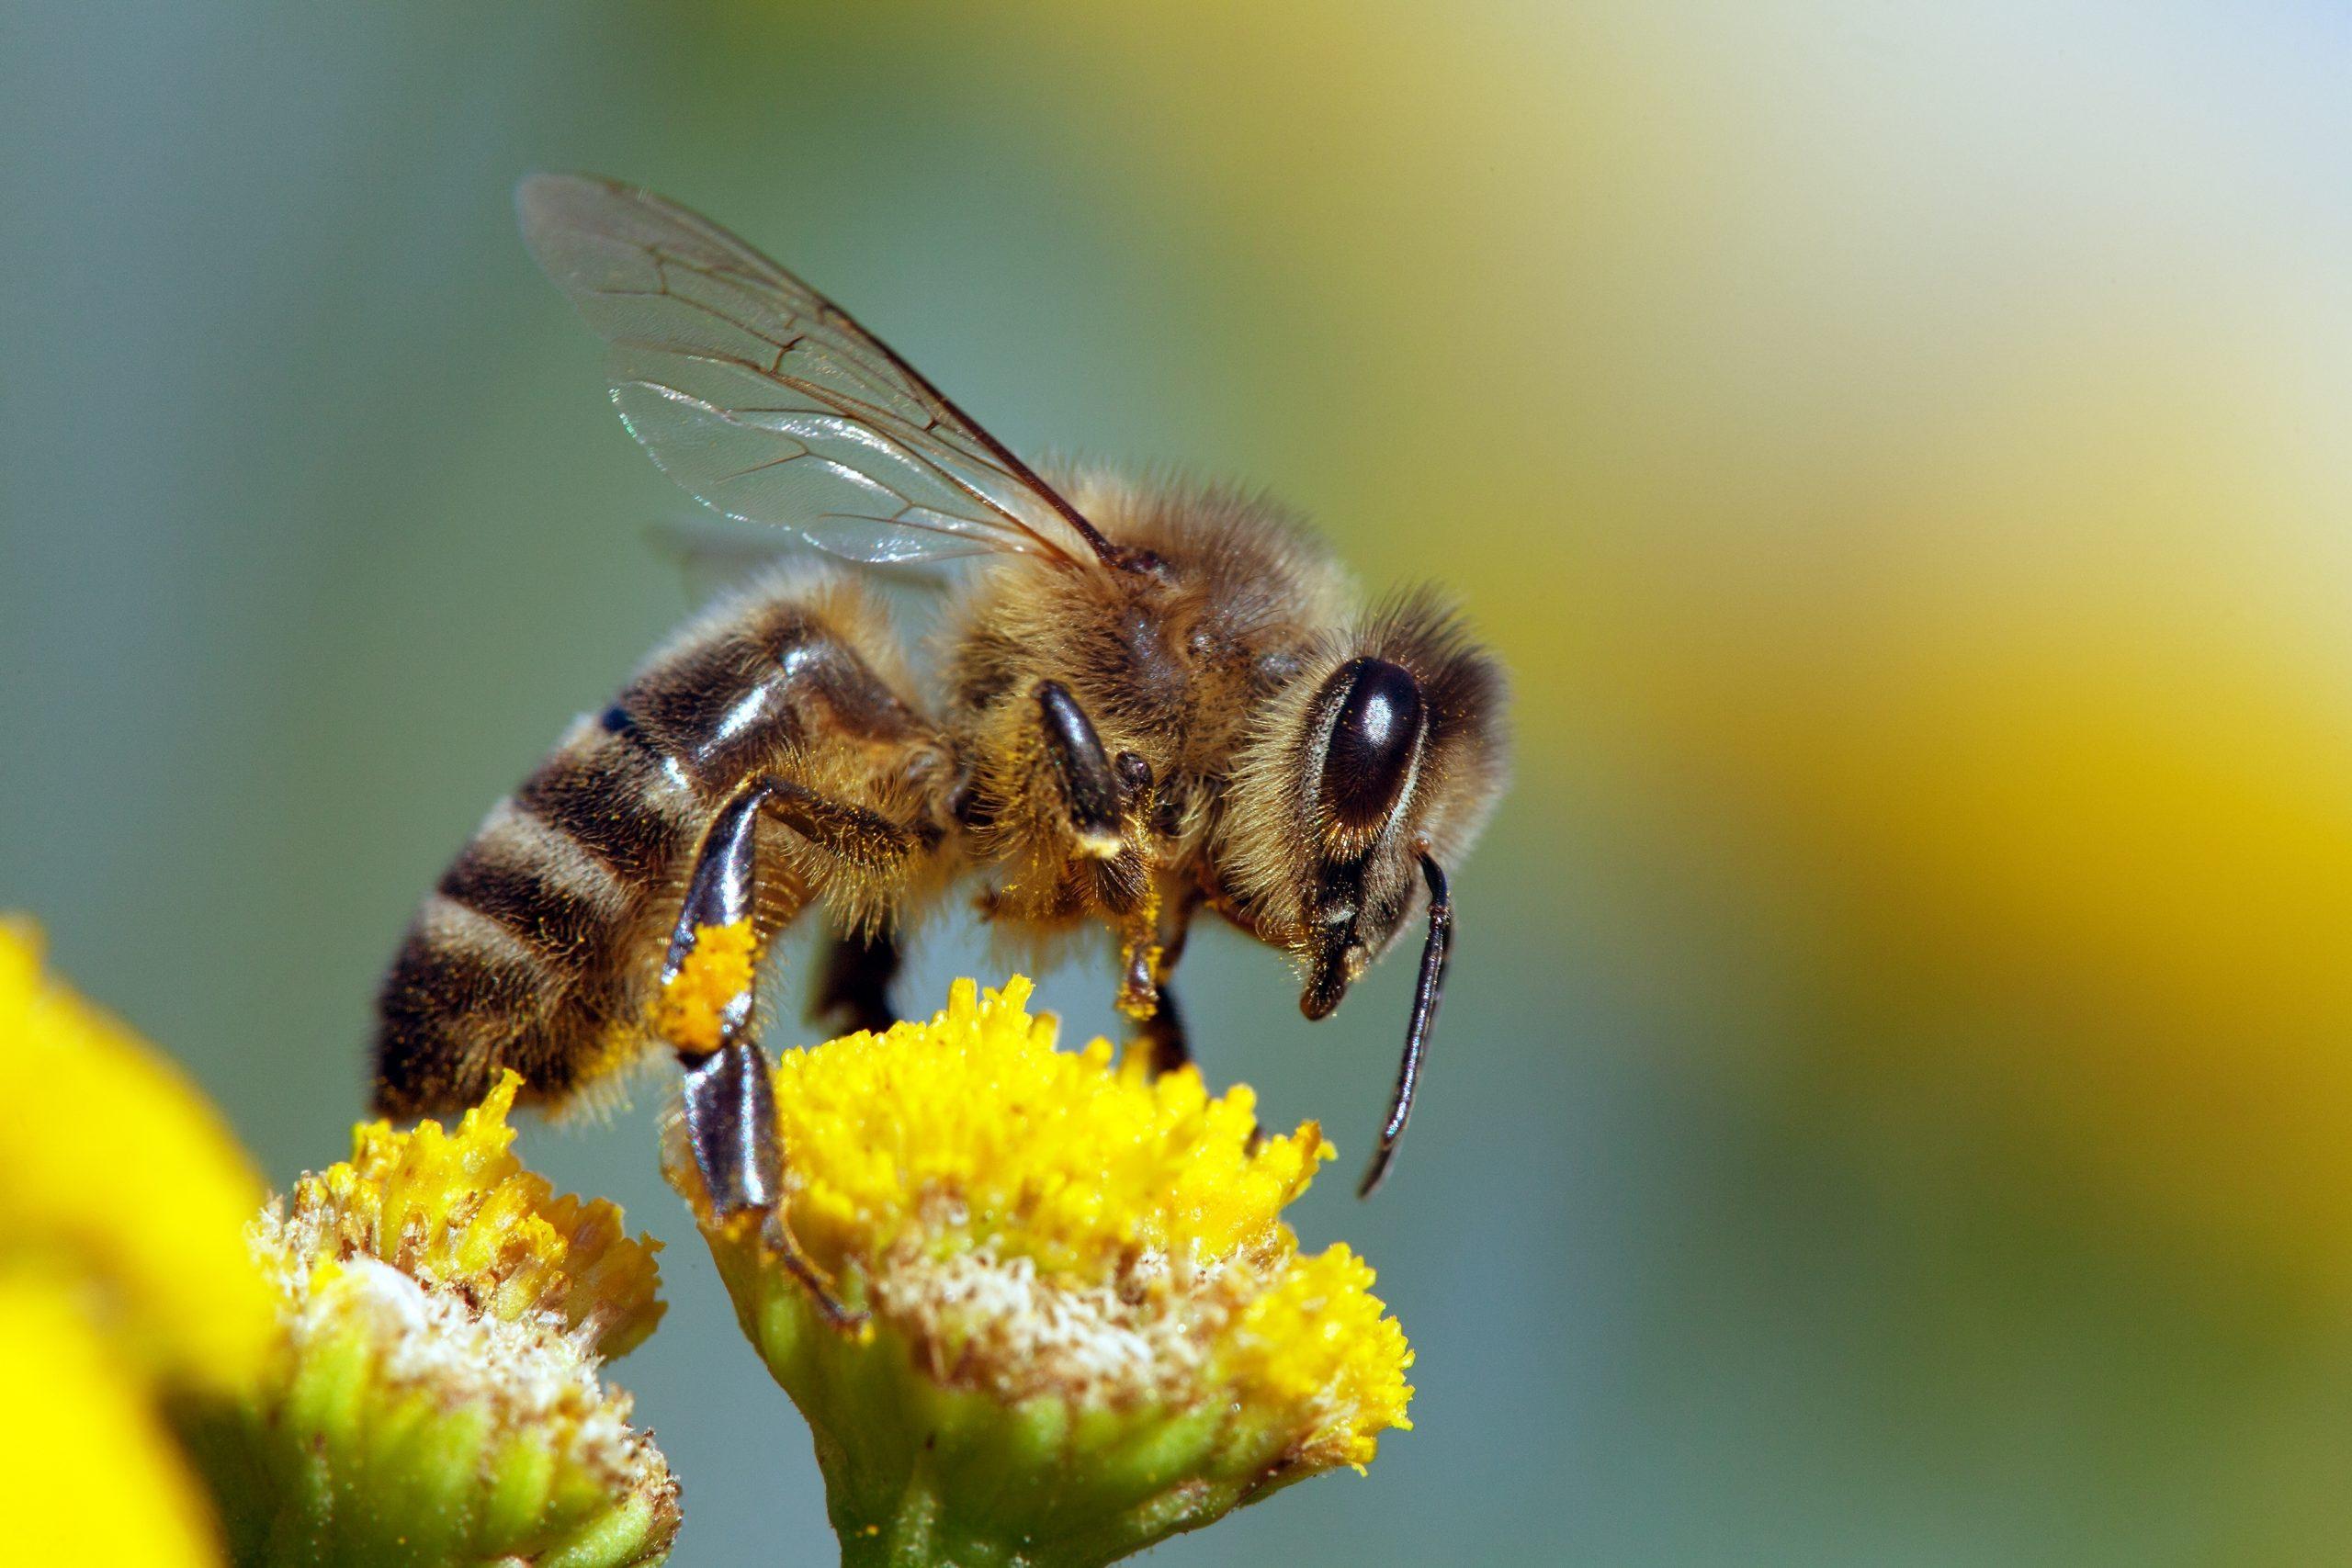 Close Up Of Western Honey Bee (Apis Mellifera) Pollinating